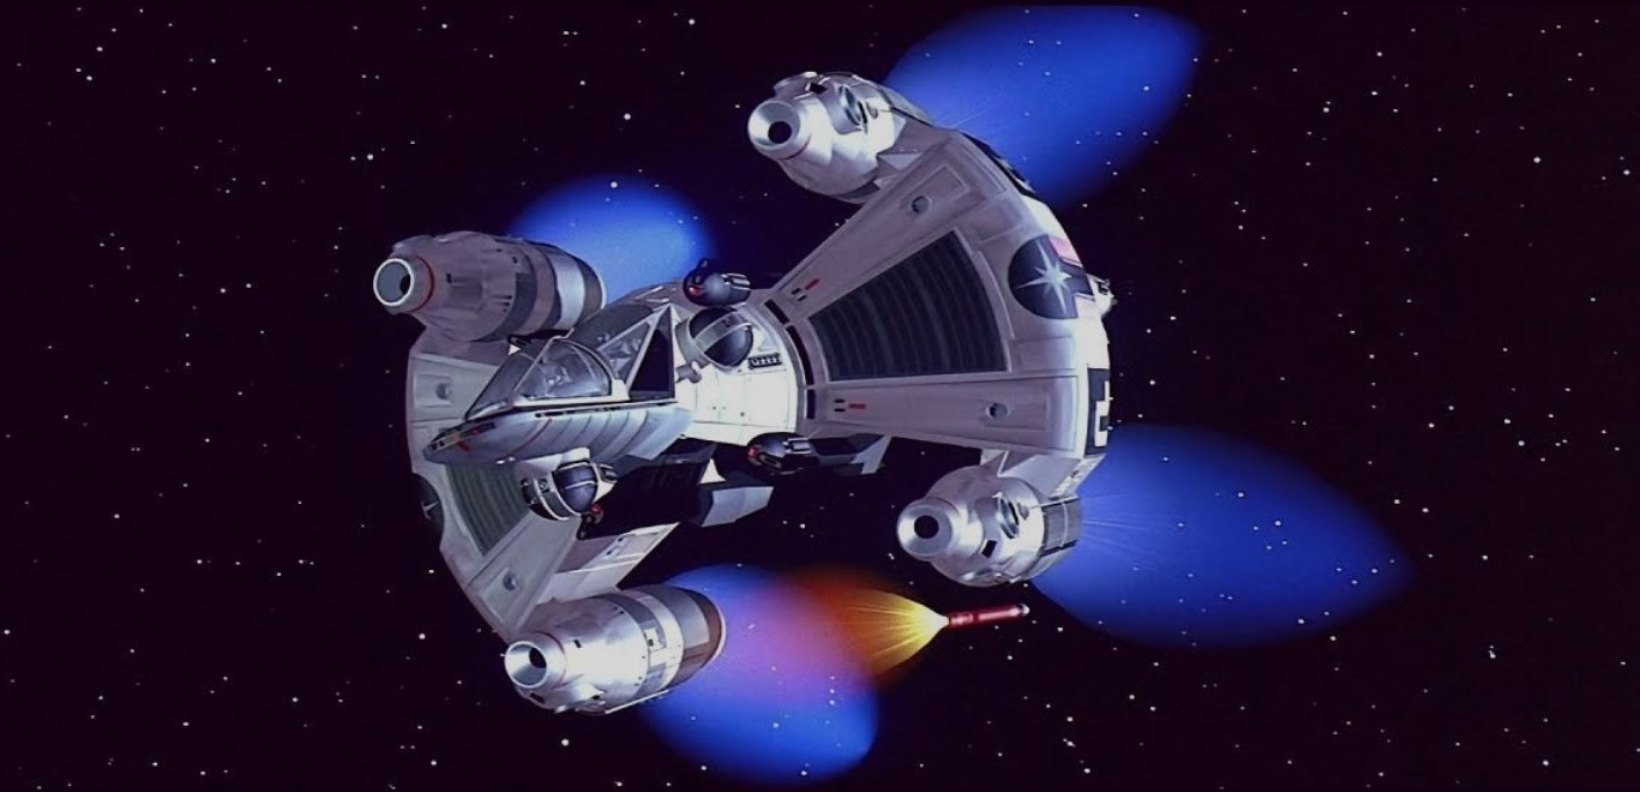 The Gunstar from The Last Starfighter (1984)